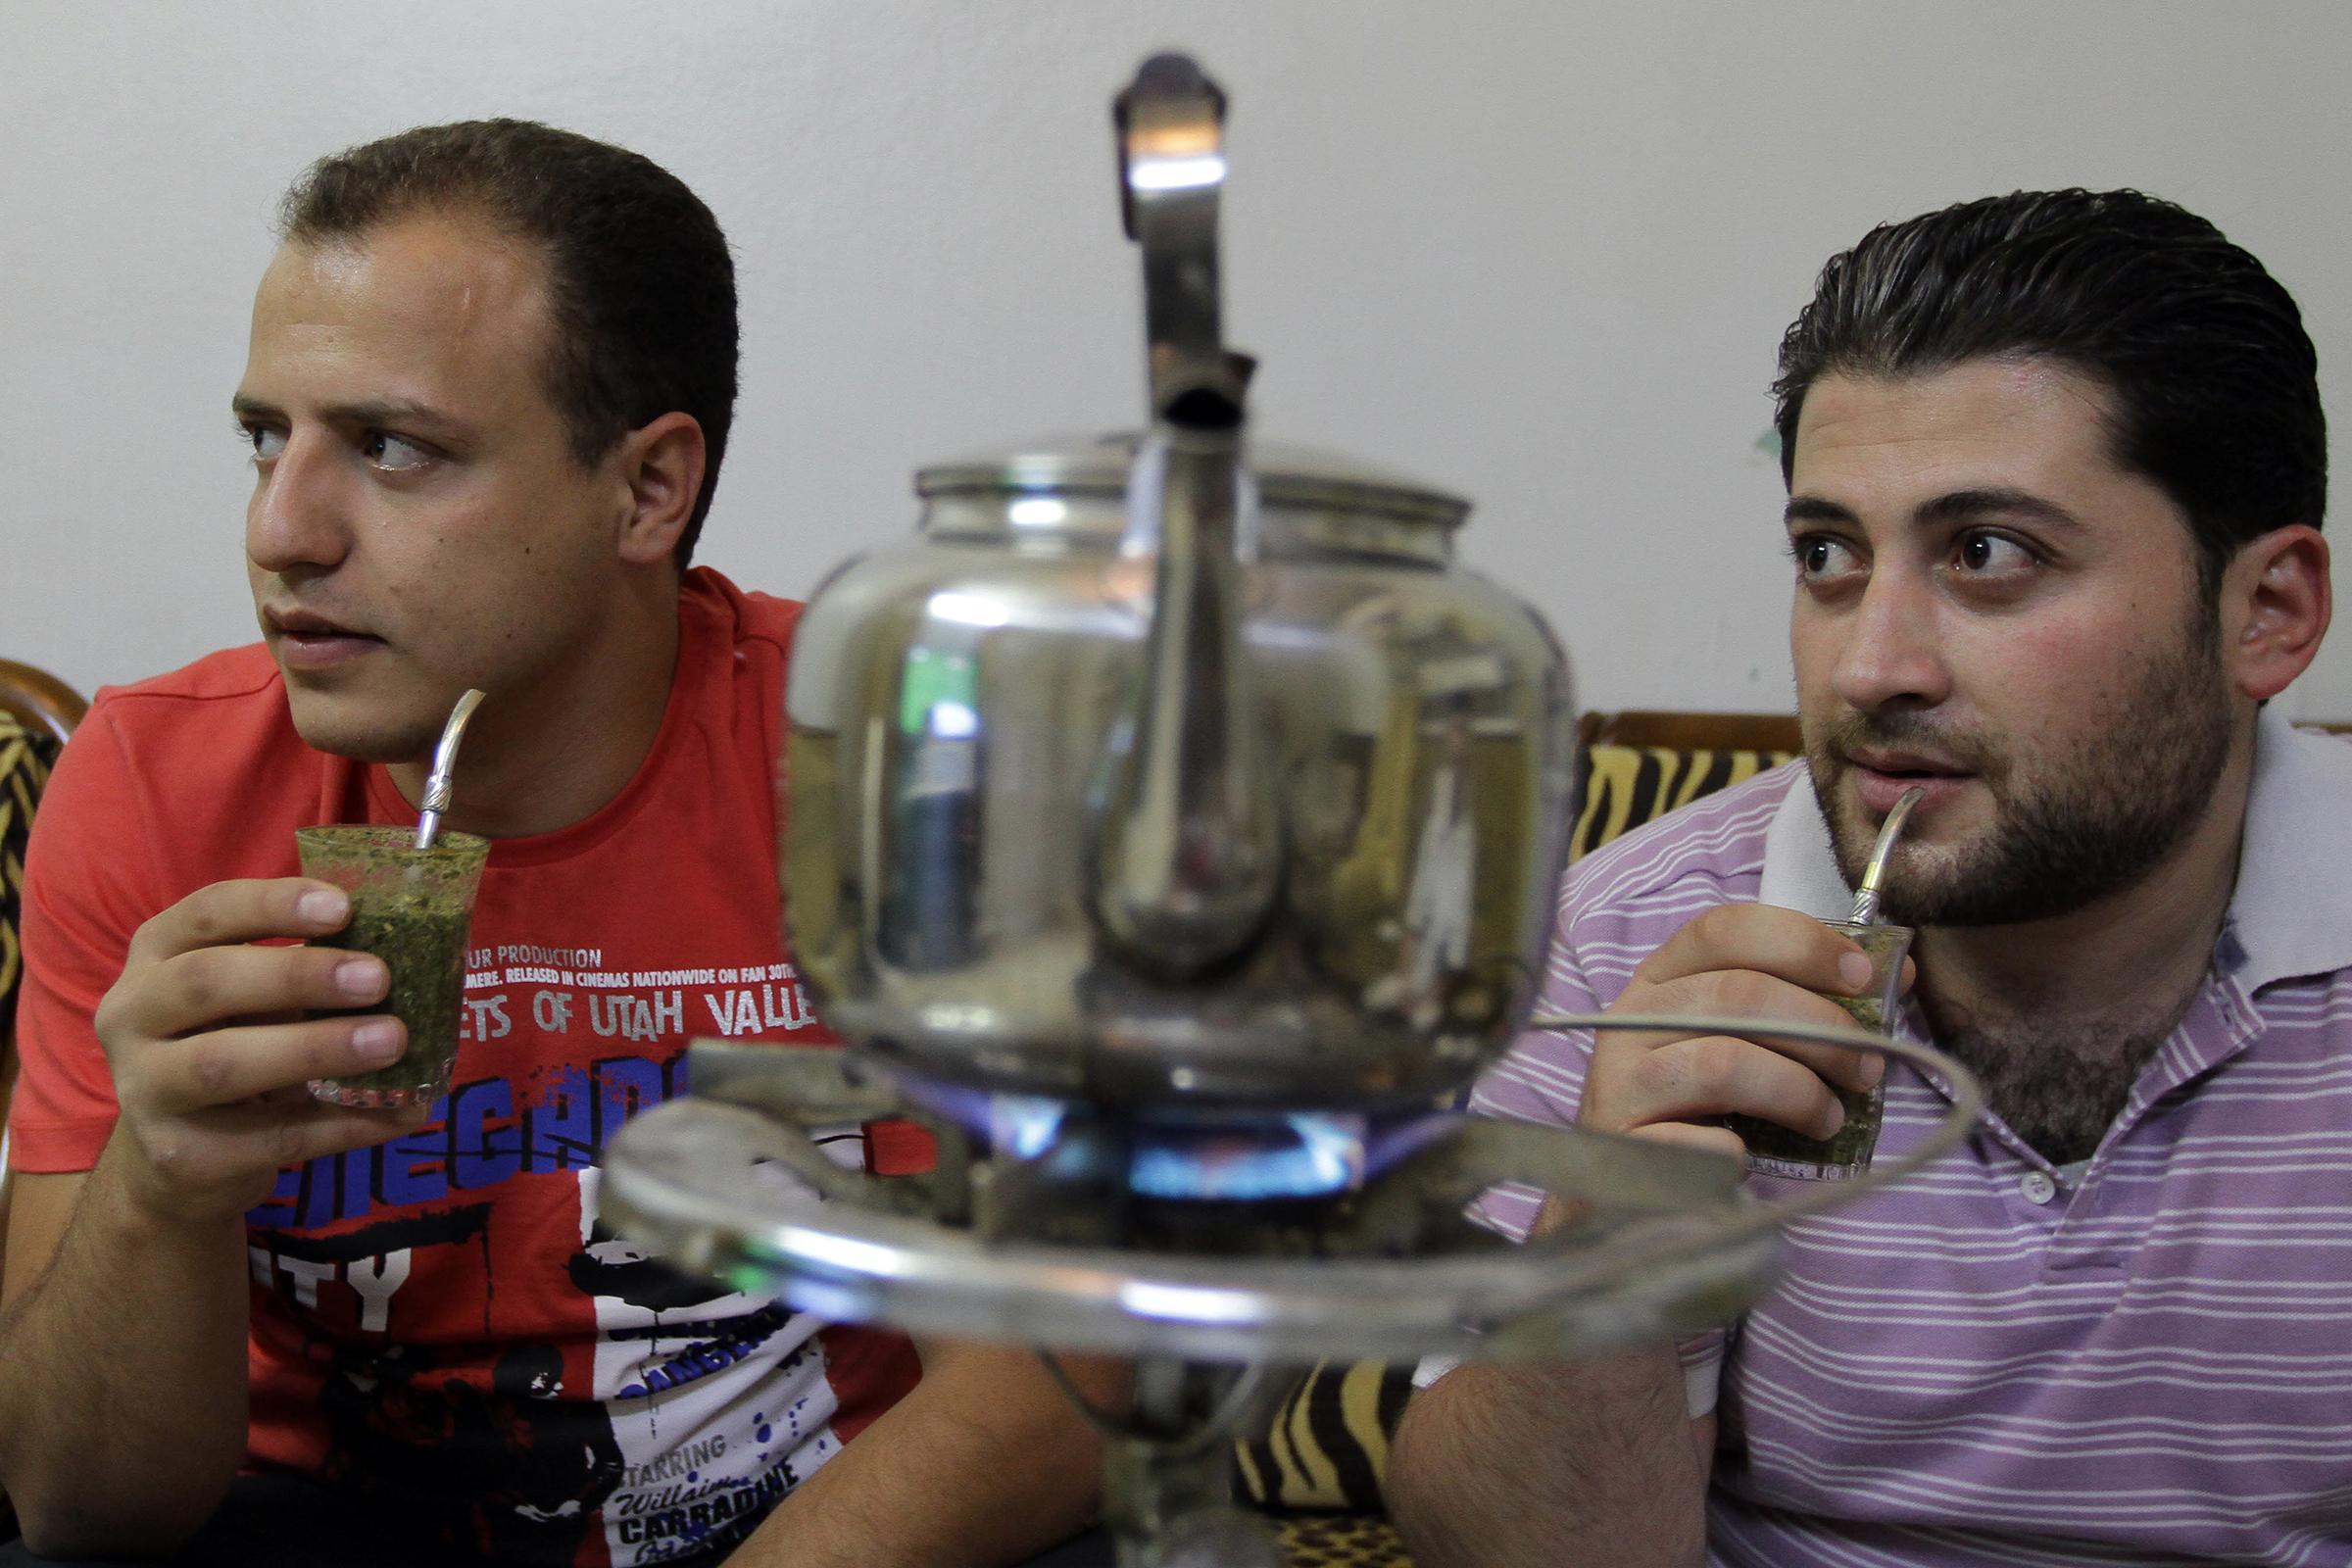 MATE.TEA.SYRIA